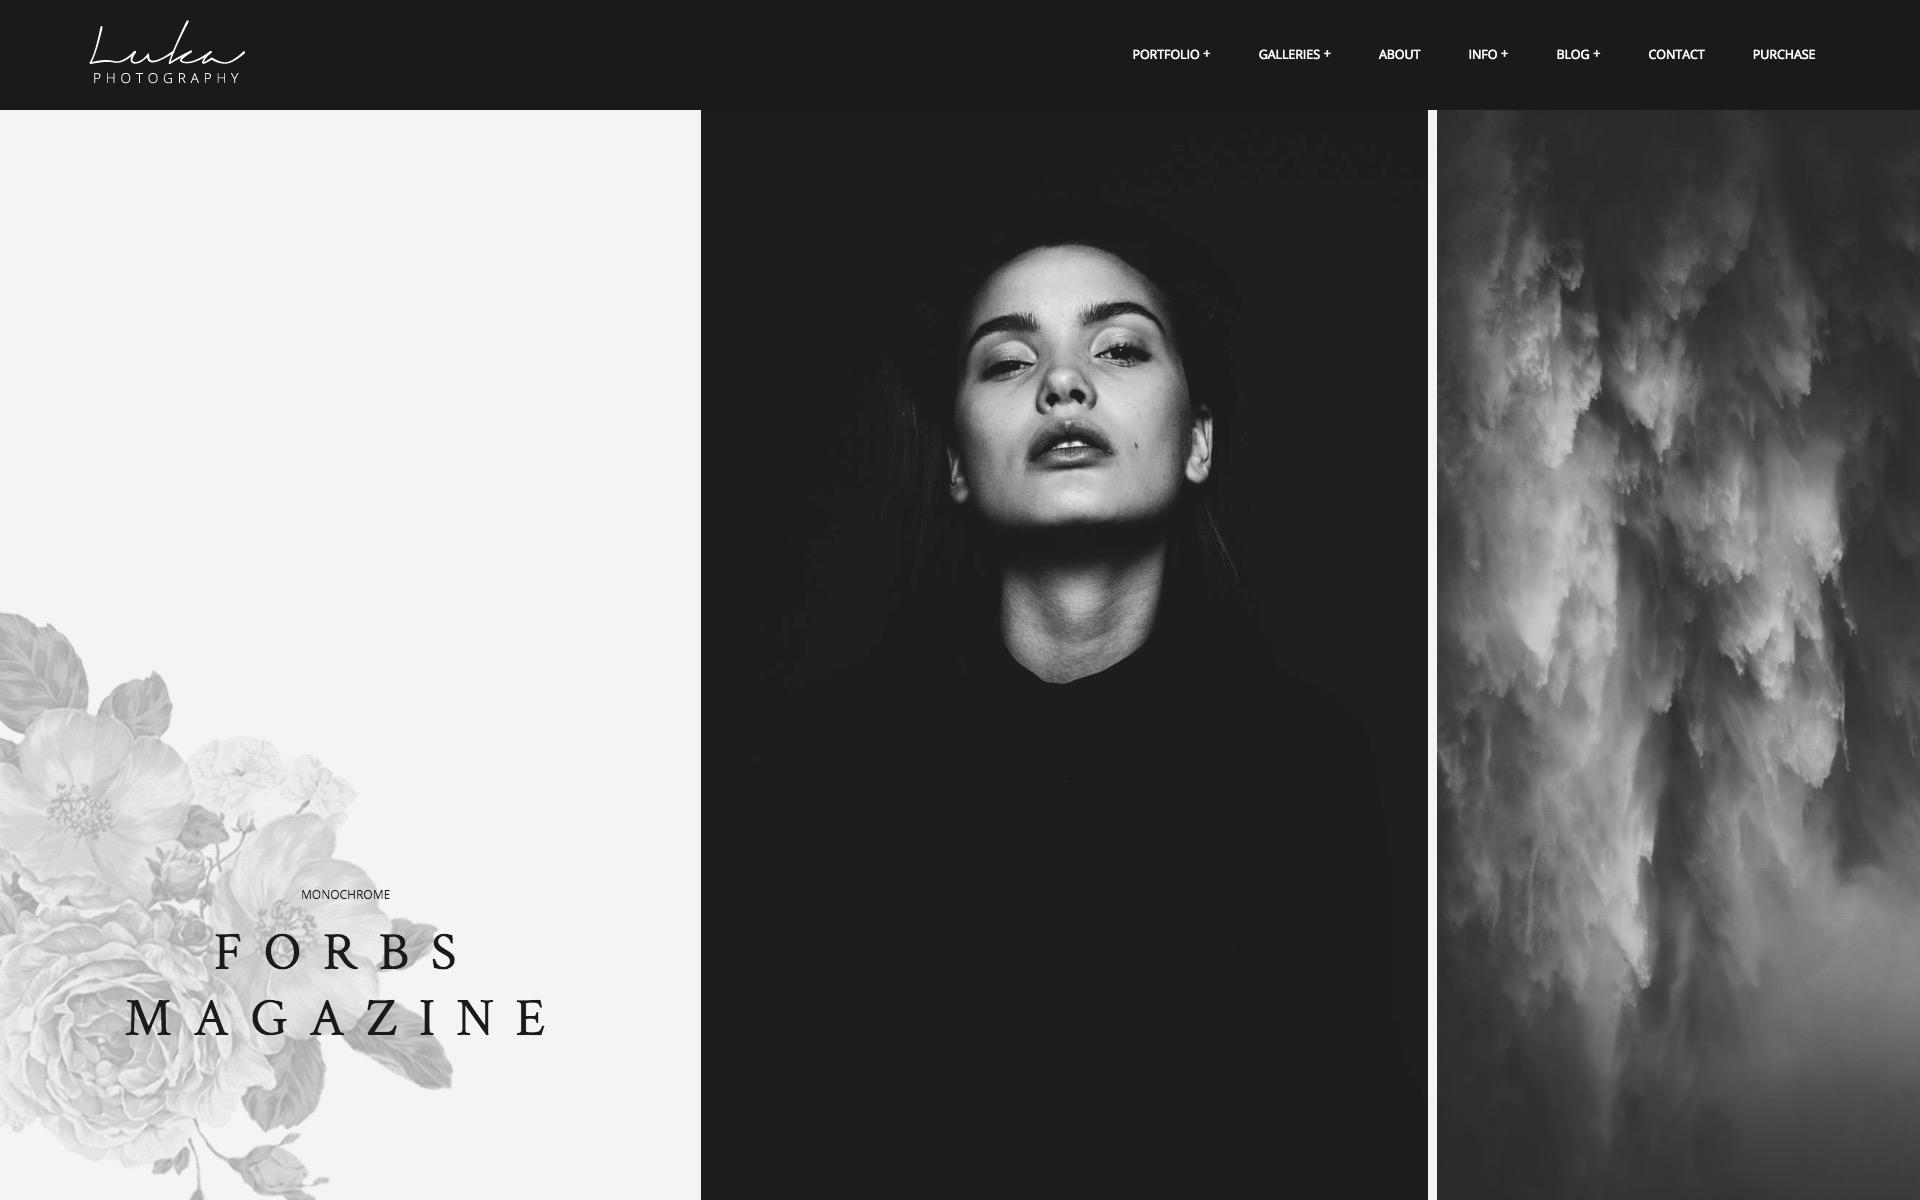 Luka Portfolio Theme for Photographers - horizontal gallery layout without text